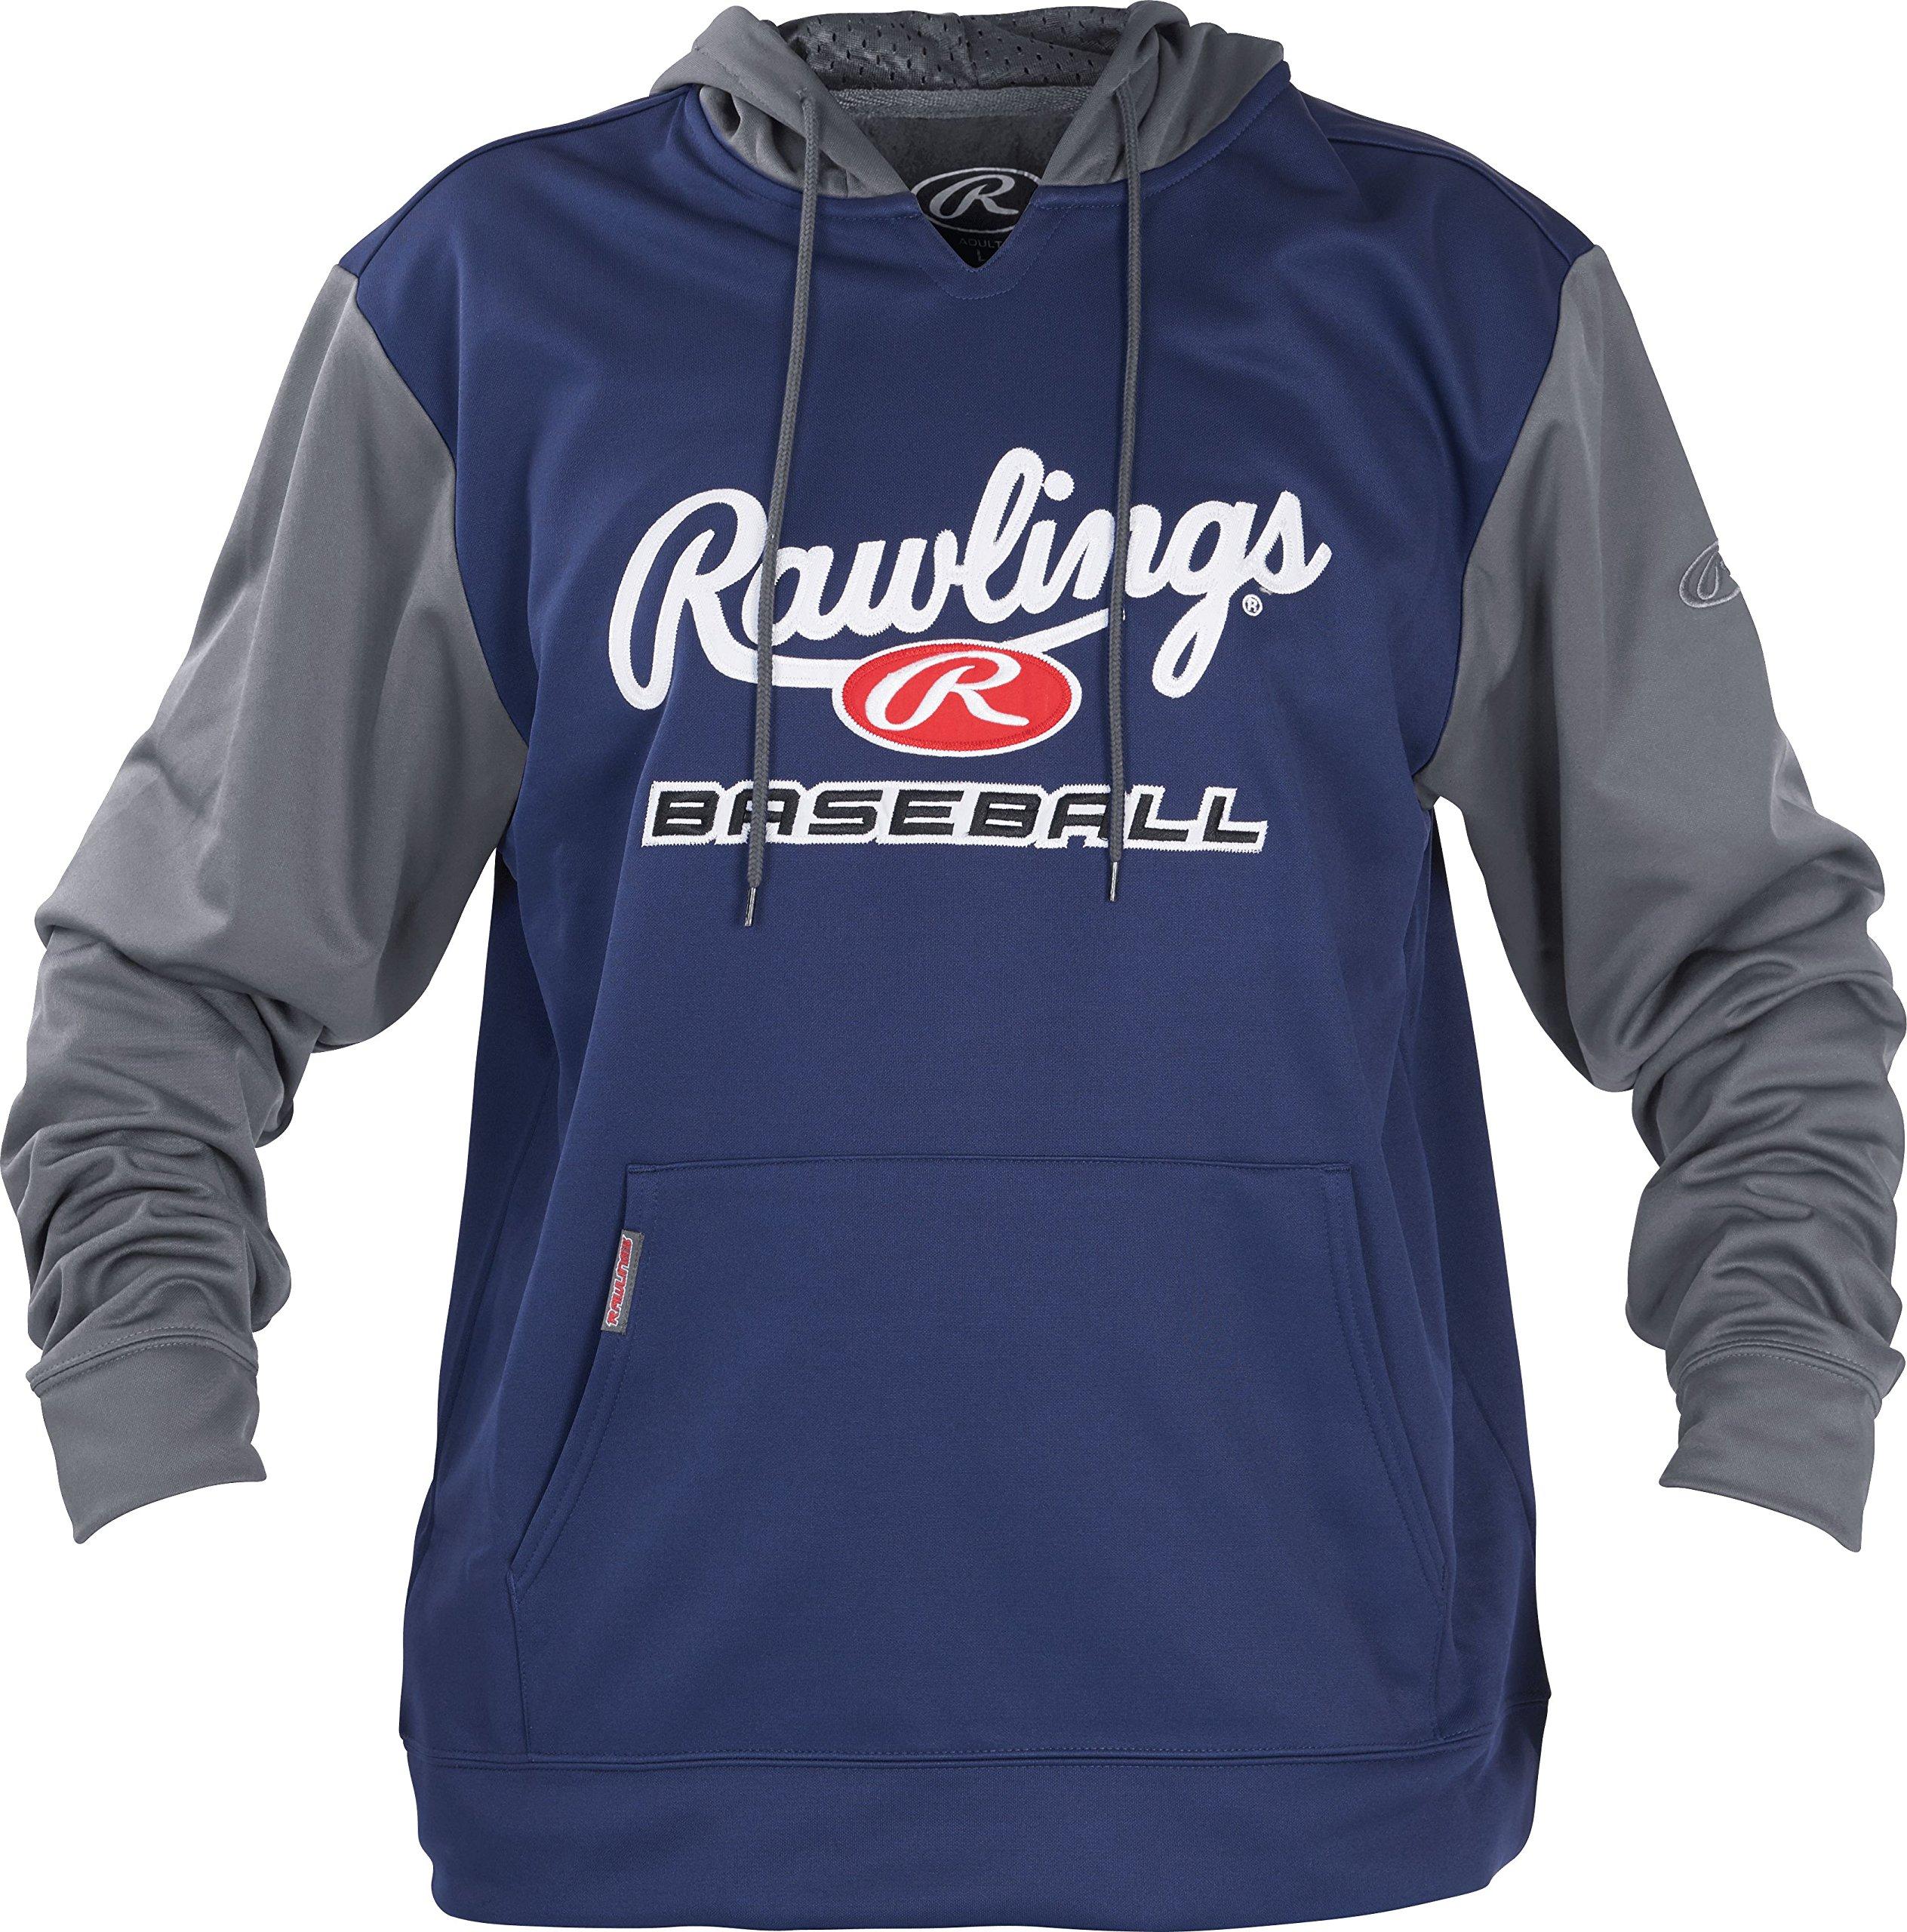 Rawlings Men's Performance Fleece Baseball Hoodie Navy/Gray Medium by Rawlings (Image #1)